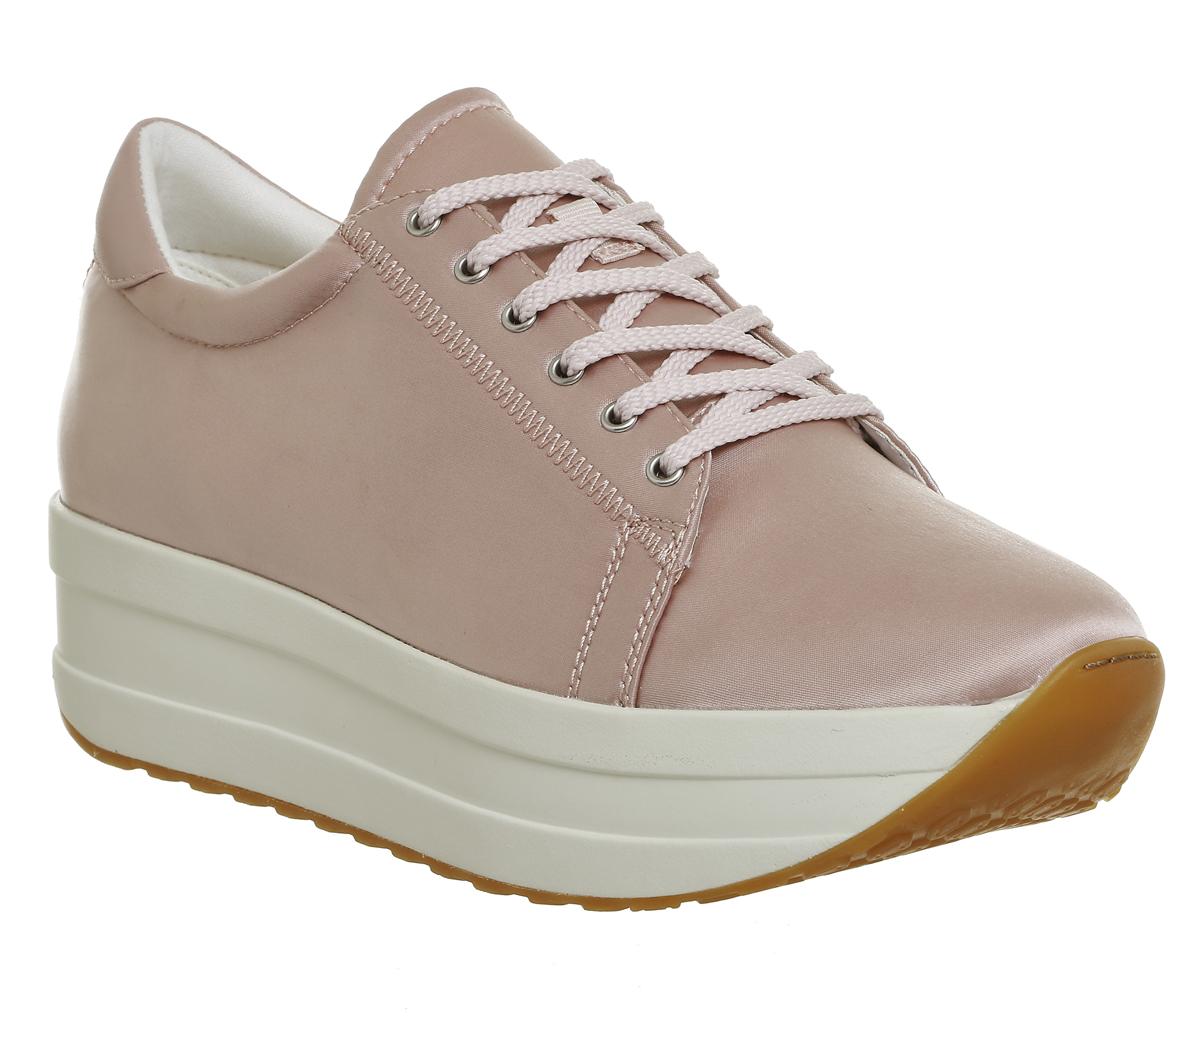 SENTINEL Vagabond Womens Casey flatform polvere allenatori raso rosa scarpe 54b8c9bceed